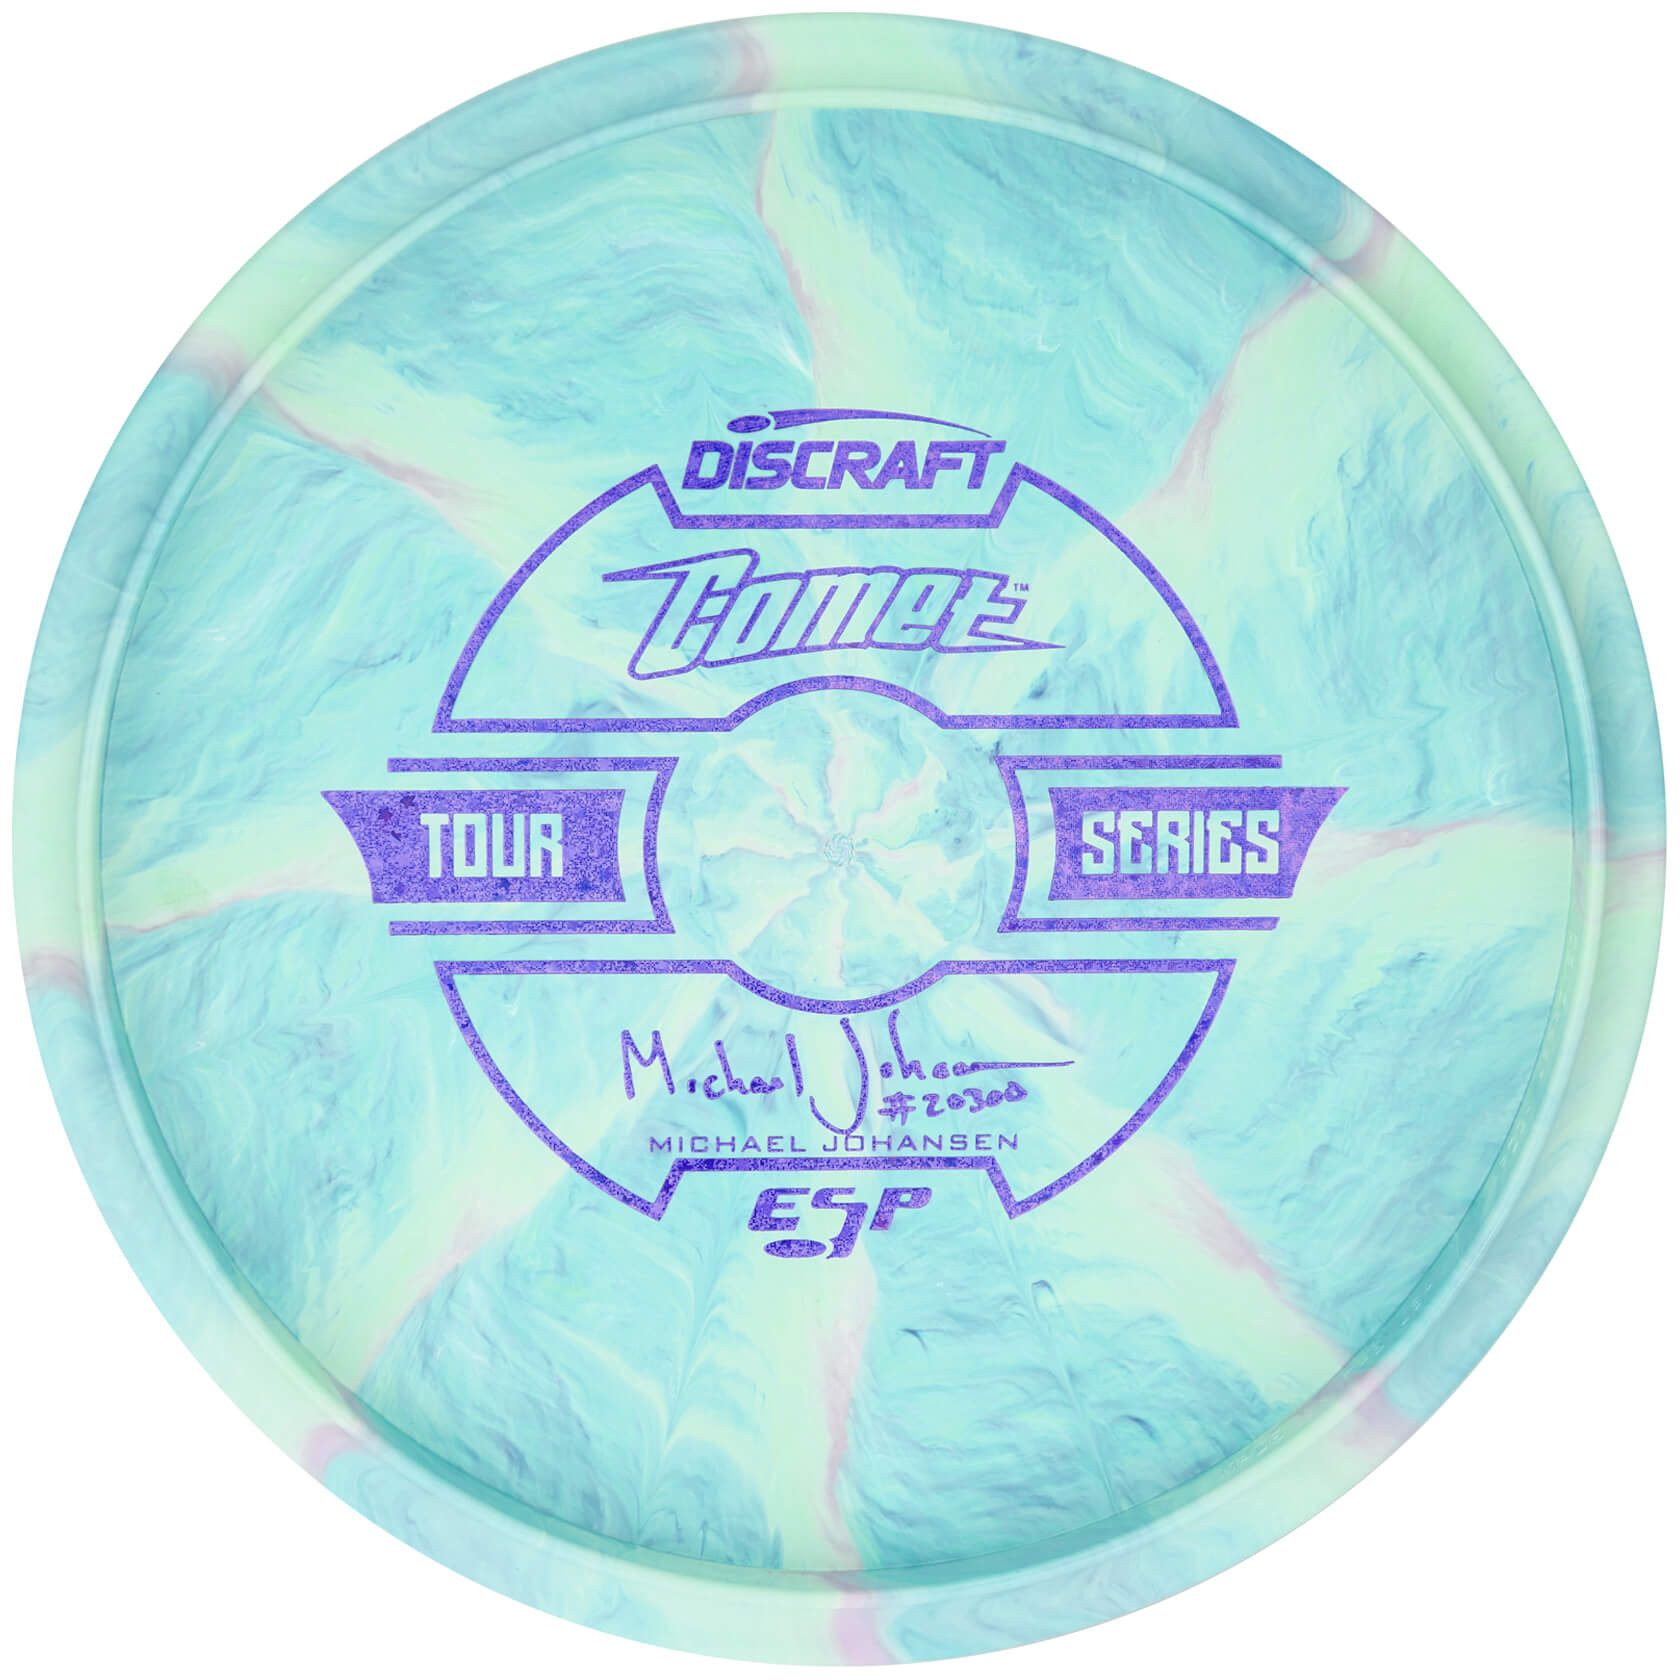 Discraft Swirly ESP Comet Michael Johansen 2019 Tour Series